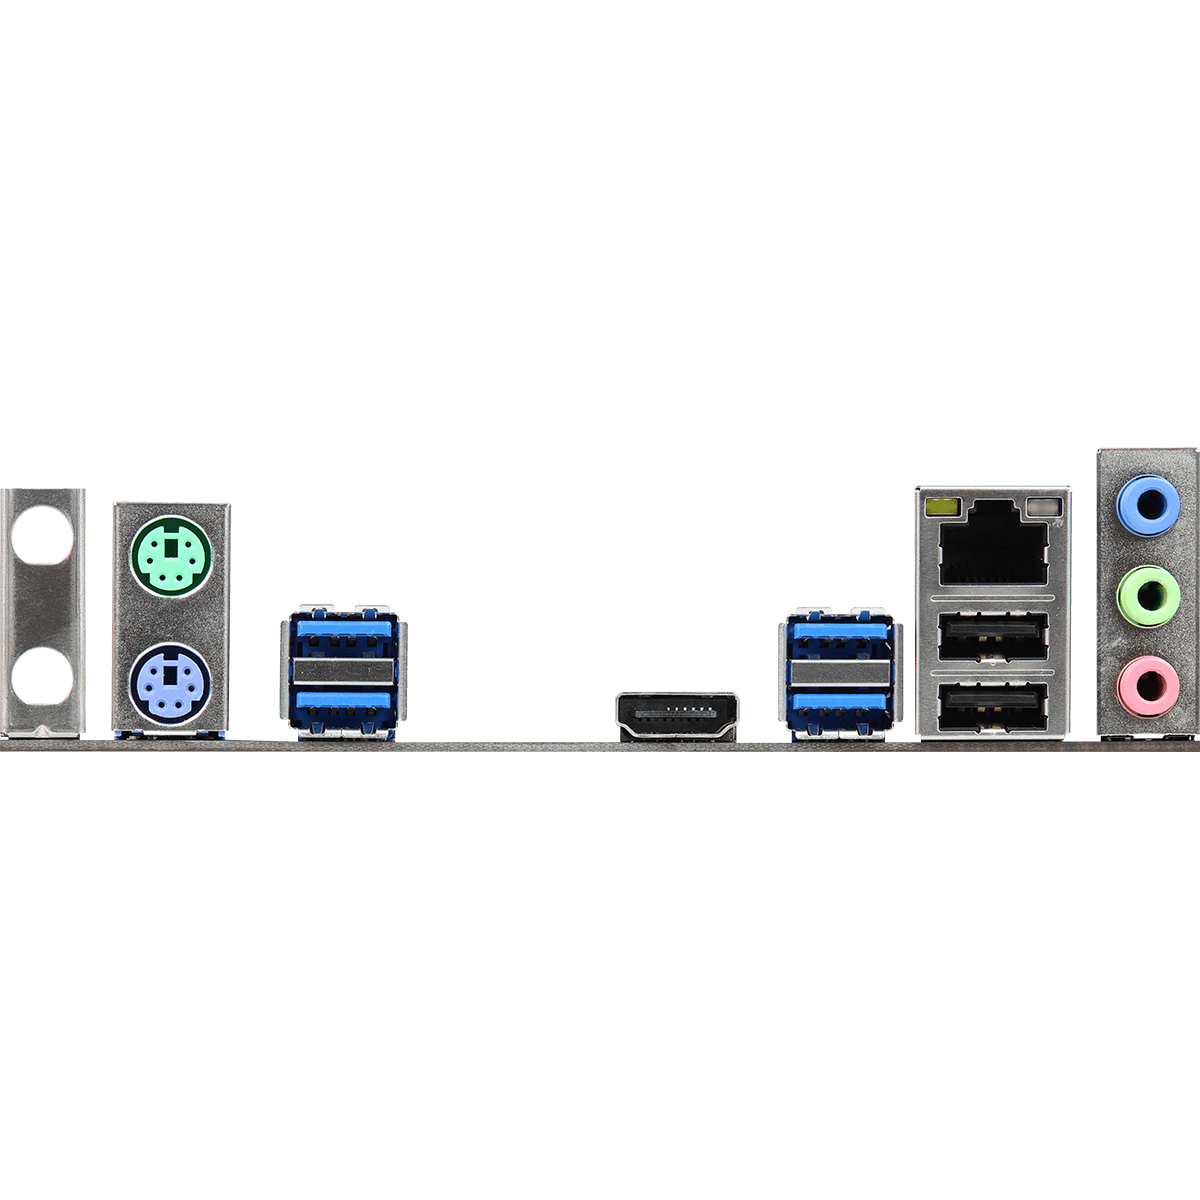 Placa Mãe Asrock Z390 Phantom Gaming 4S, Chipset Z390, Intel LGA 1151, ATX, DDR4